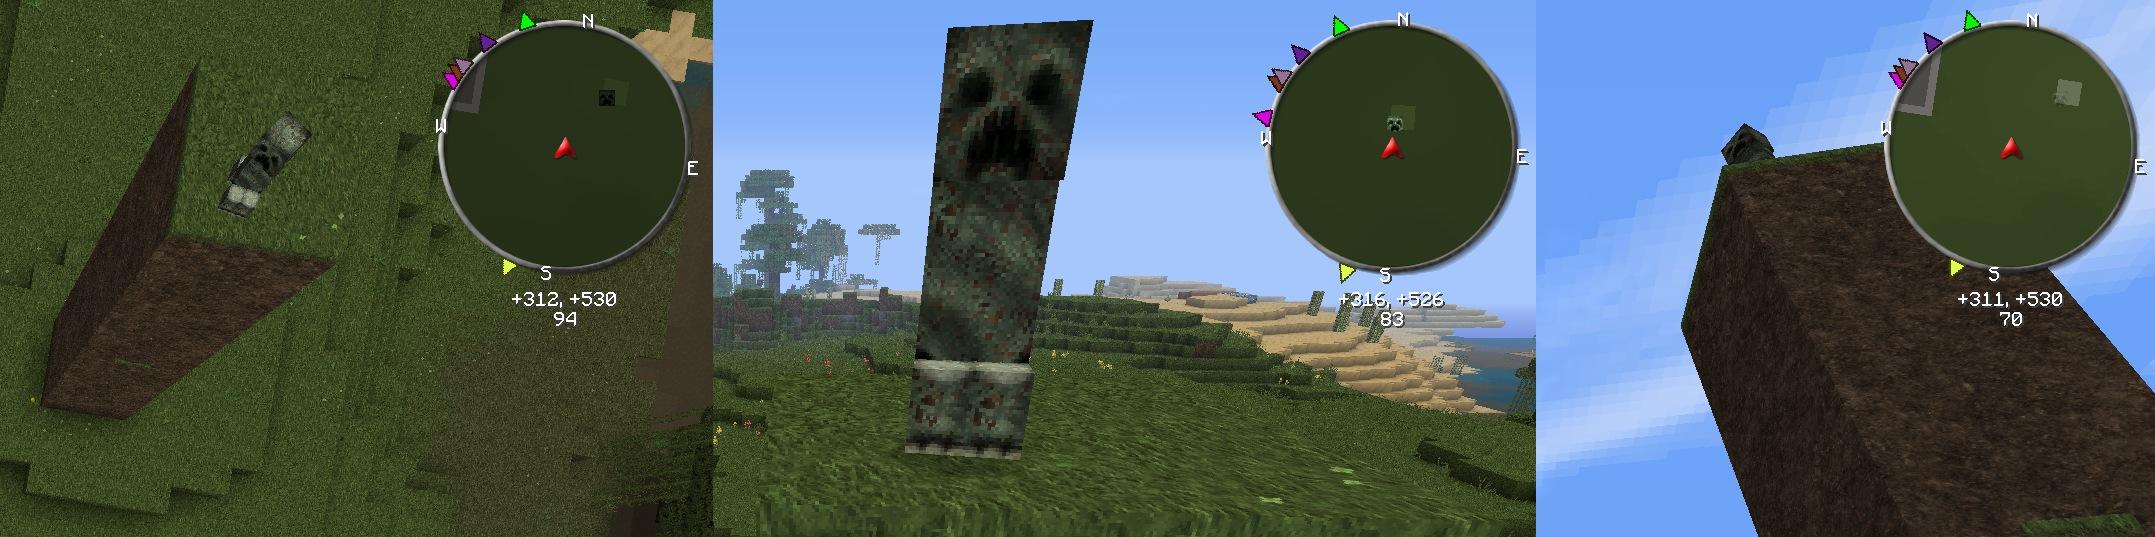 a823c  mobicons Zan's Minimap Mod for Minecraft 1.4.4/1.4.5